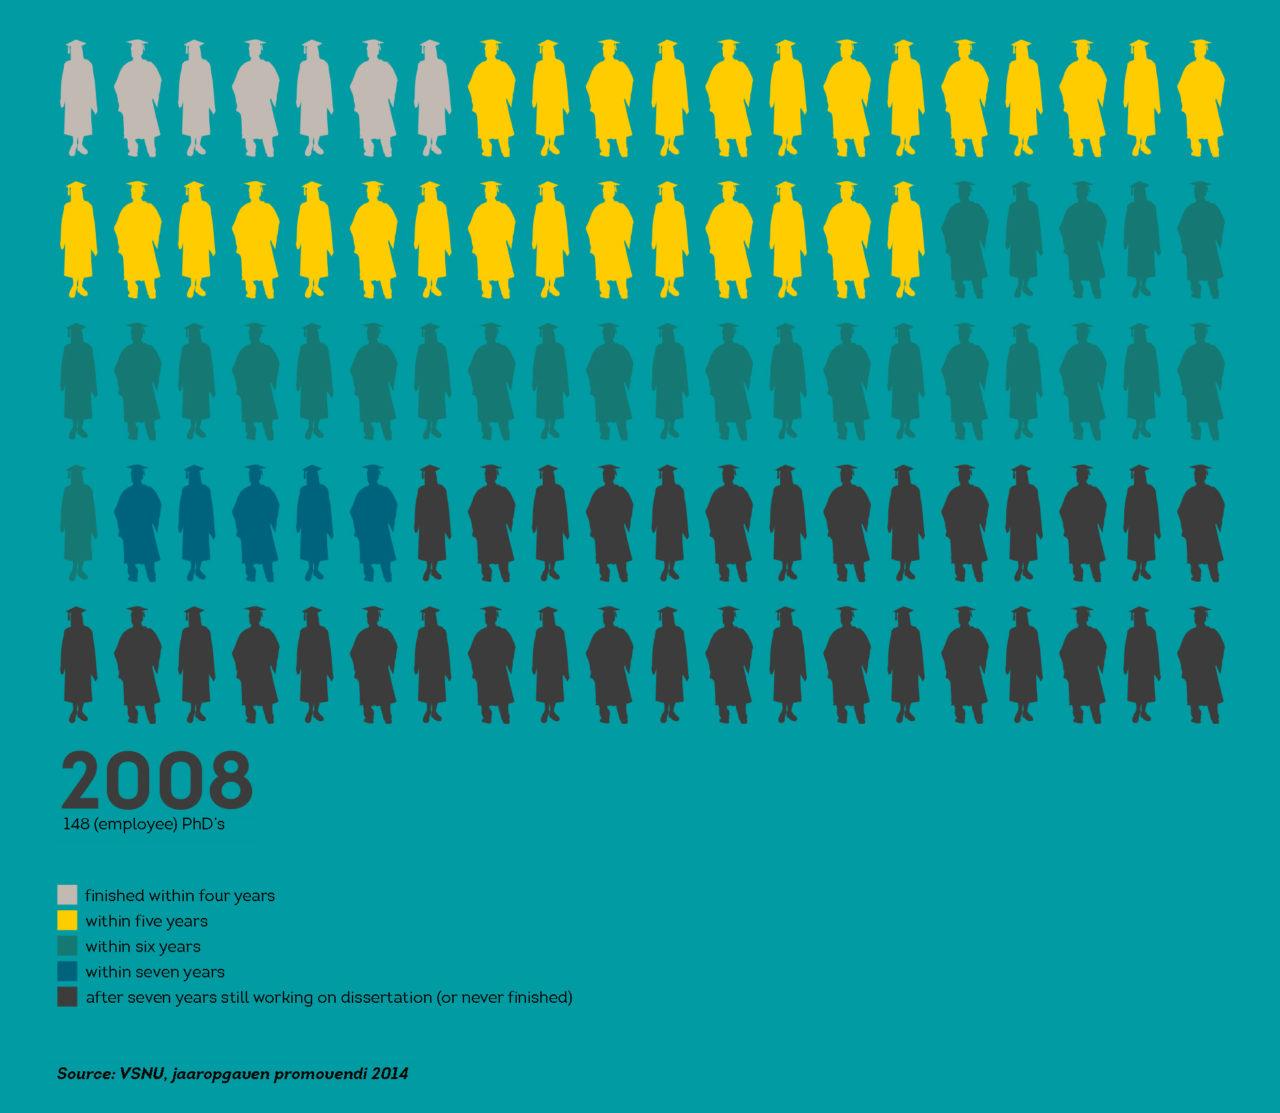 promovendirendement 2008 infographic english